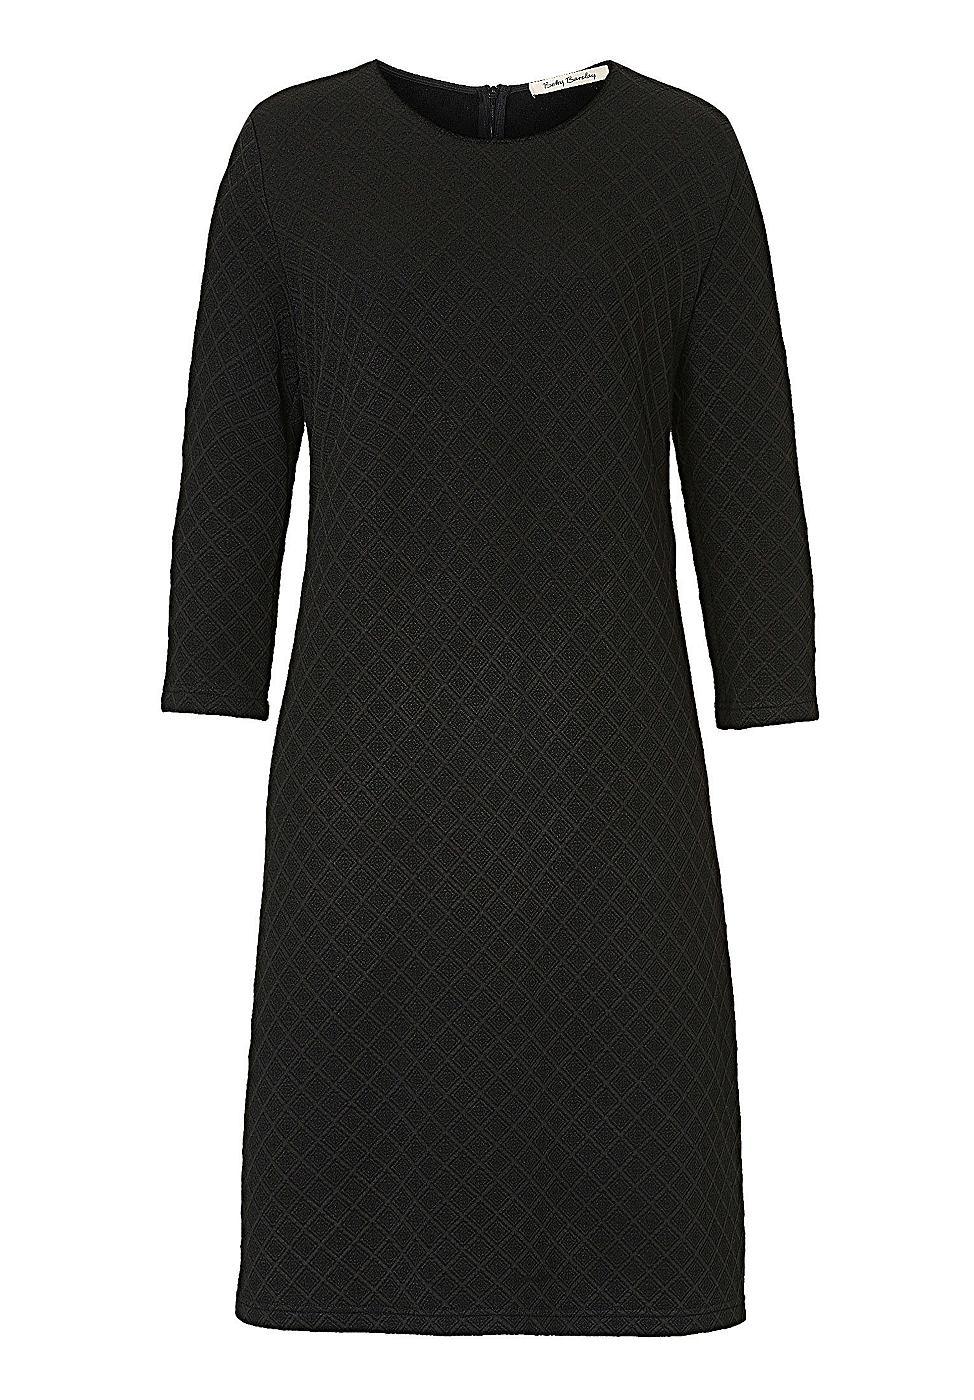 Betty Barclay jurk zwart